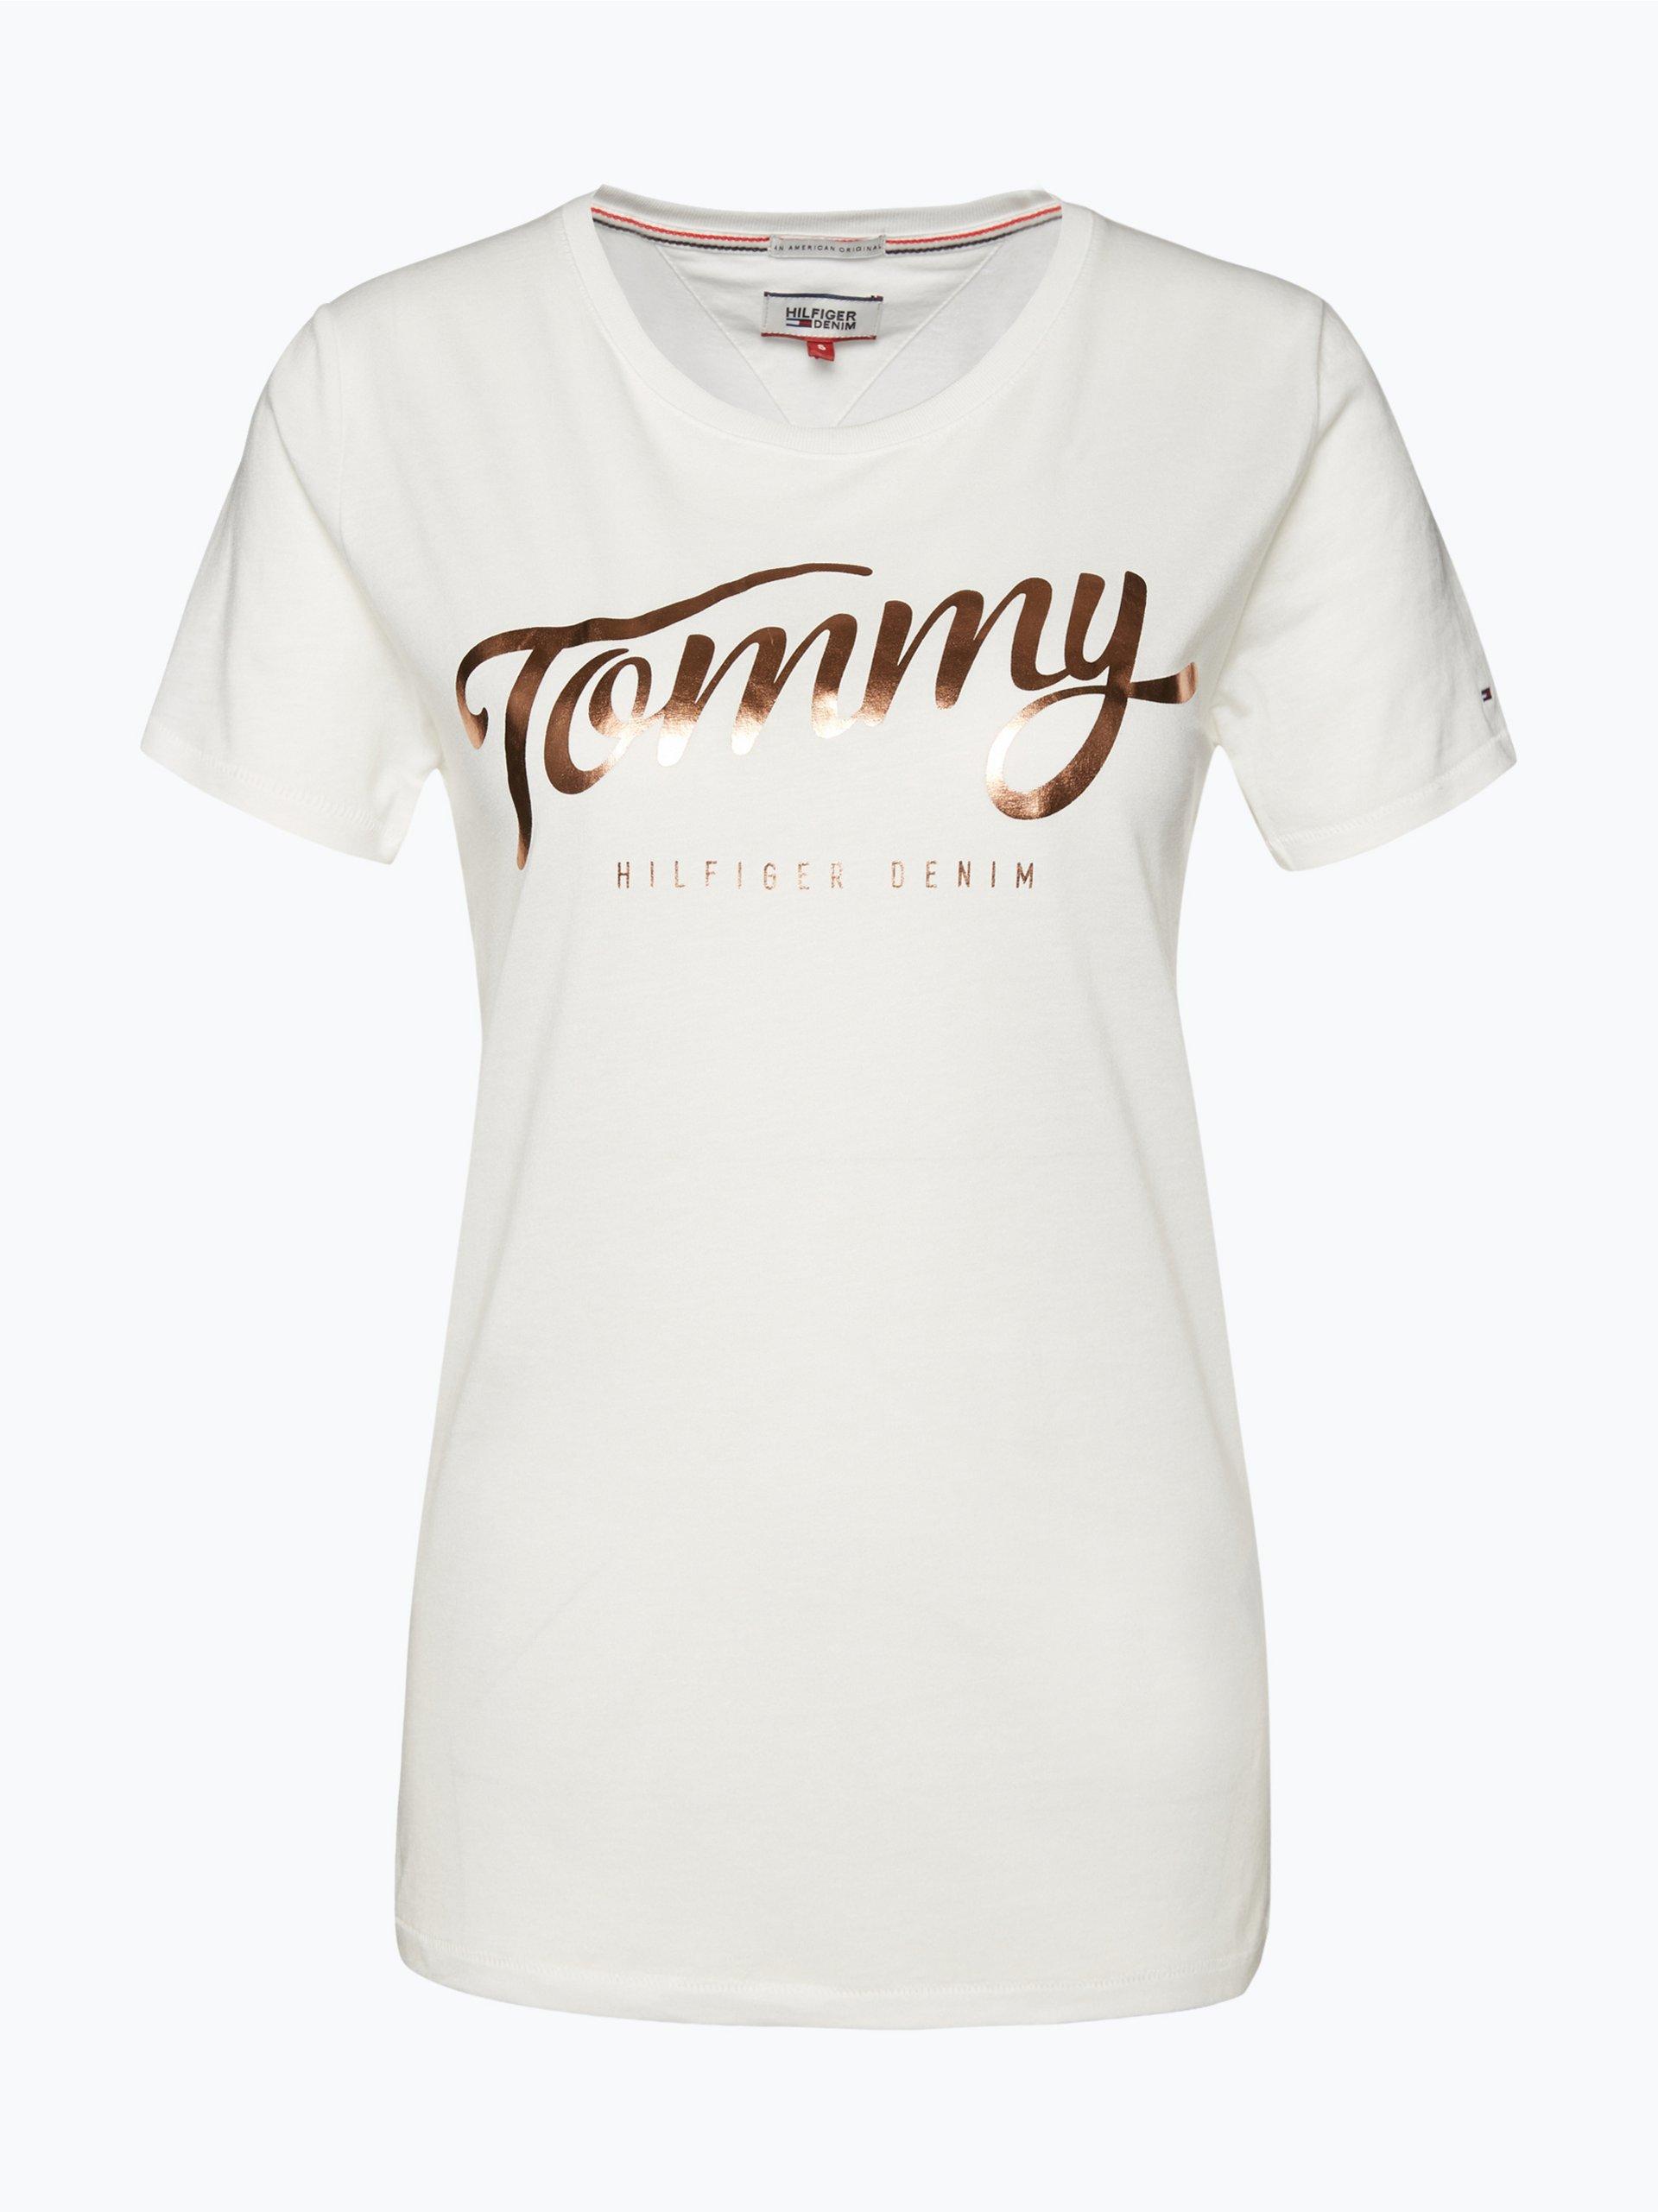 tommy jeans damen t shirt wei gemustert online kaufen. Black Bedroom Furniture Sets. Home Design Ideas